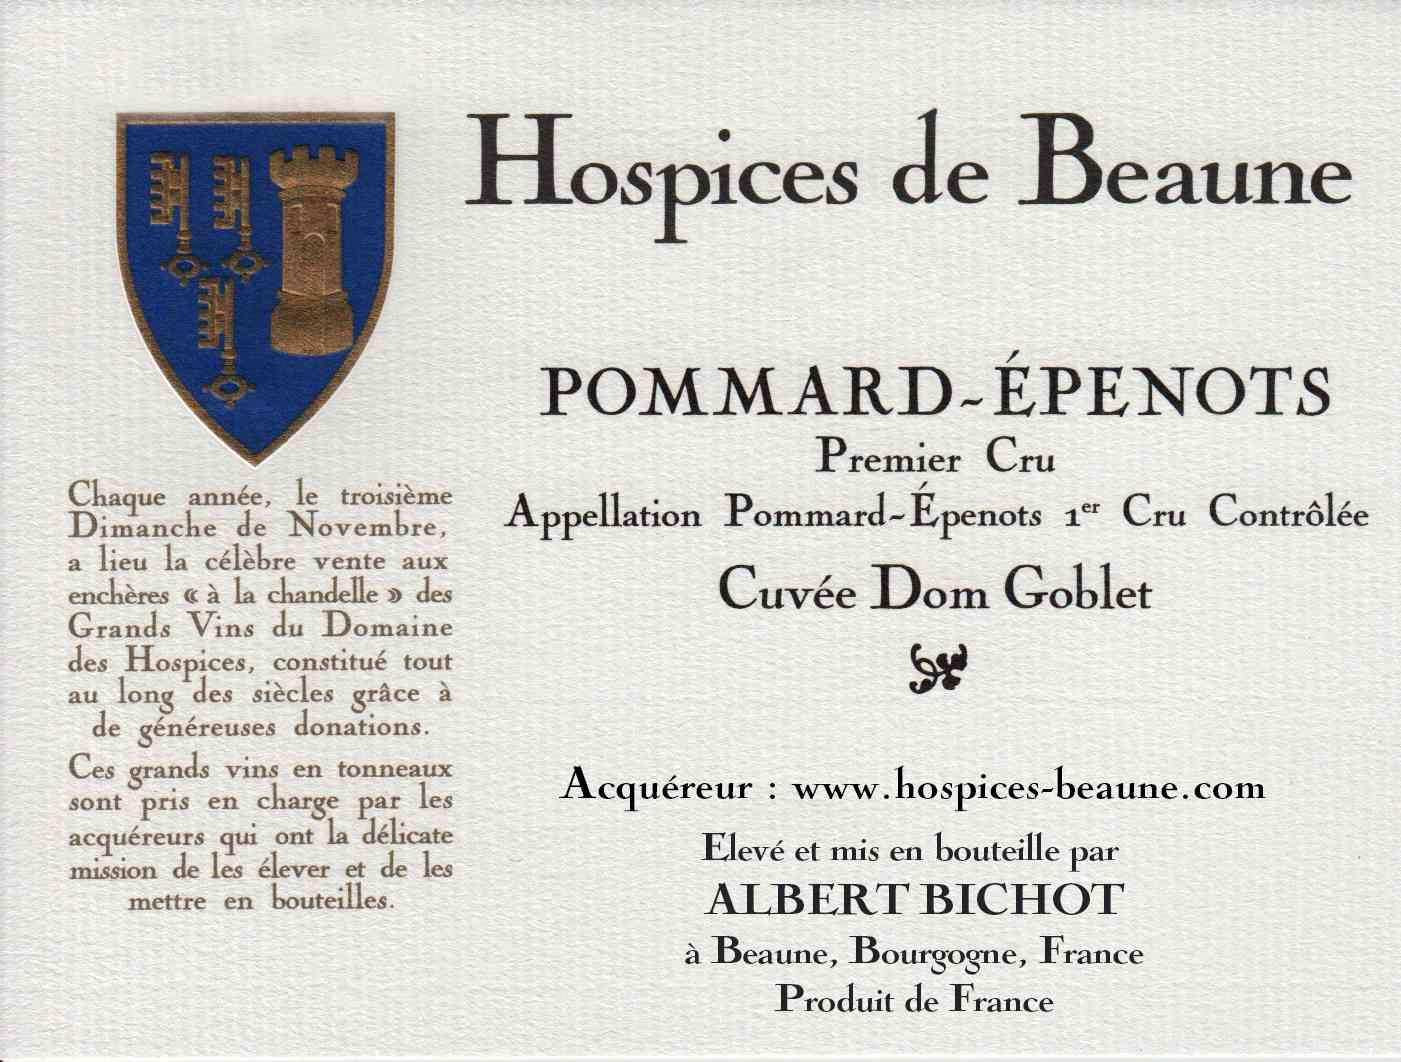 Encheres-auction-HospicesdeBeaune-AlbertBichot-PommardEpenots-PremierCru-Cuvee-DomGoblet